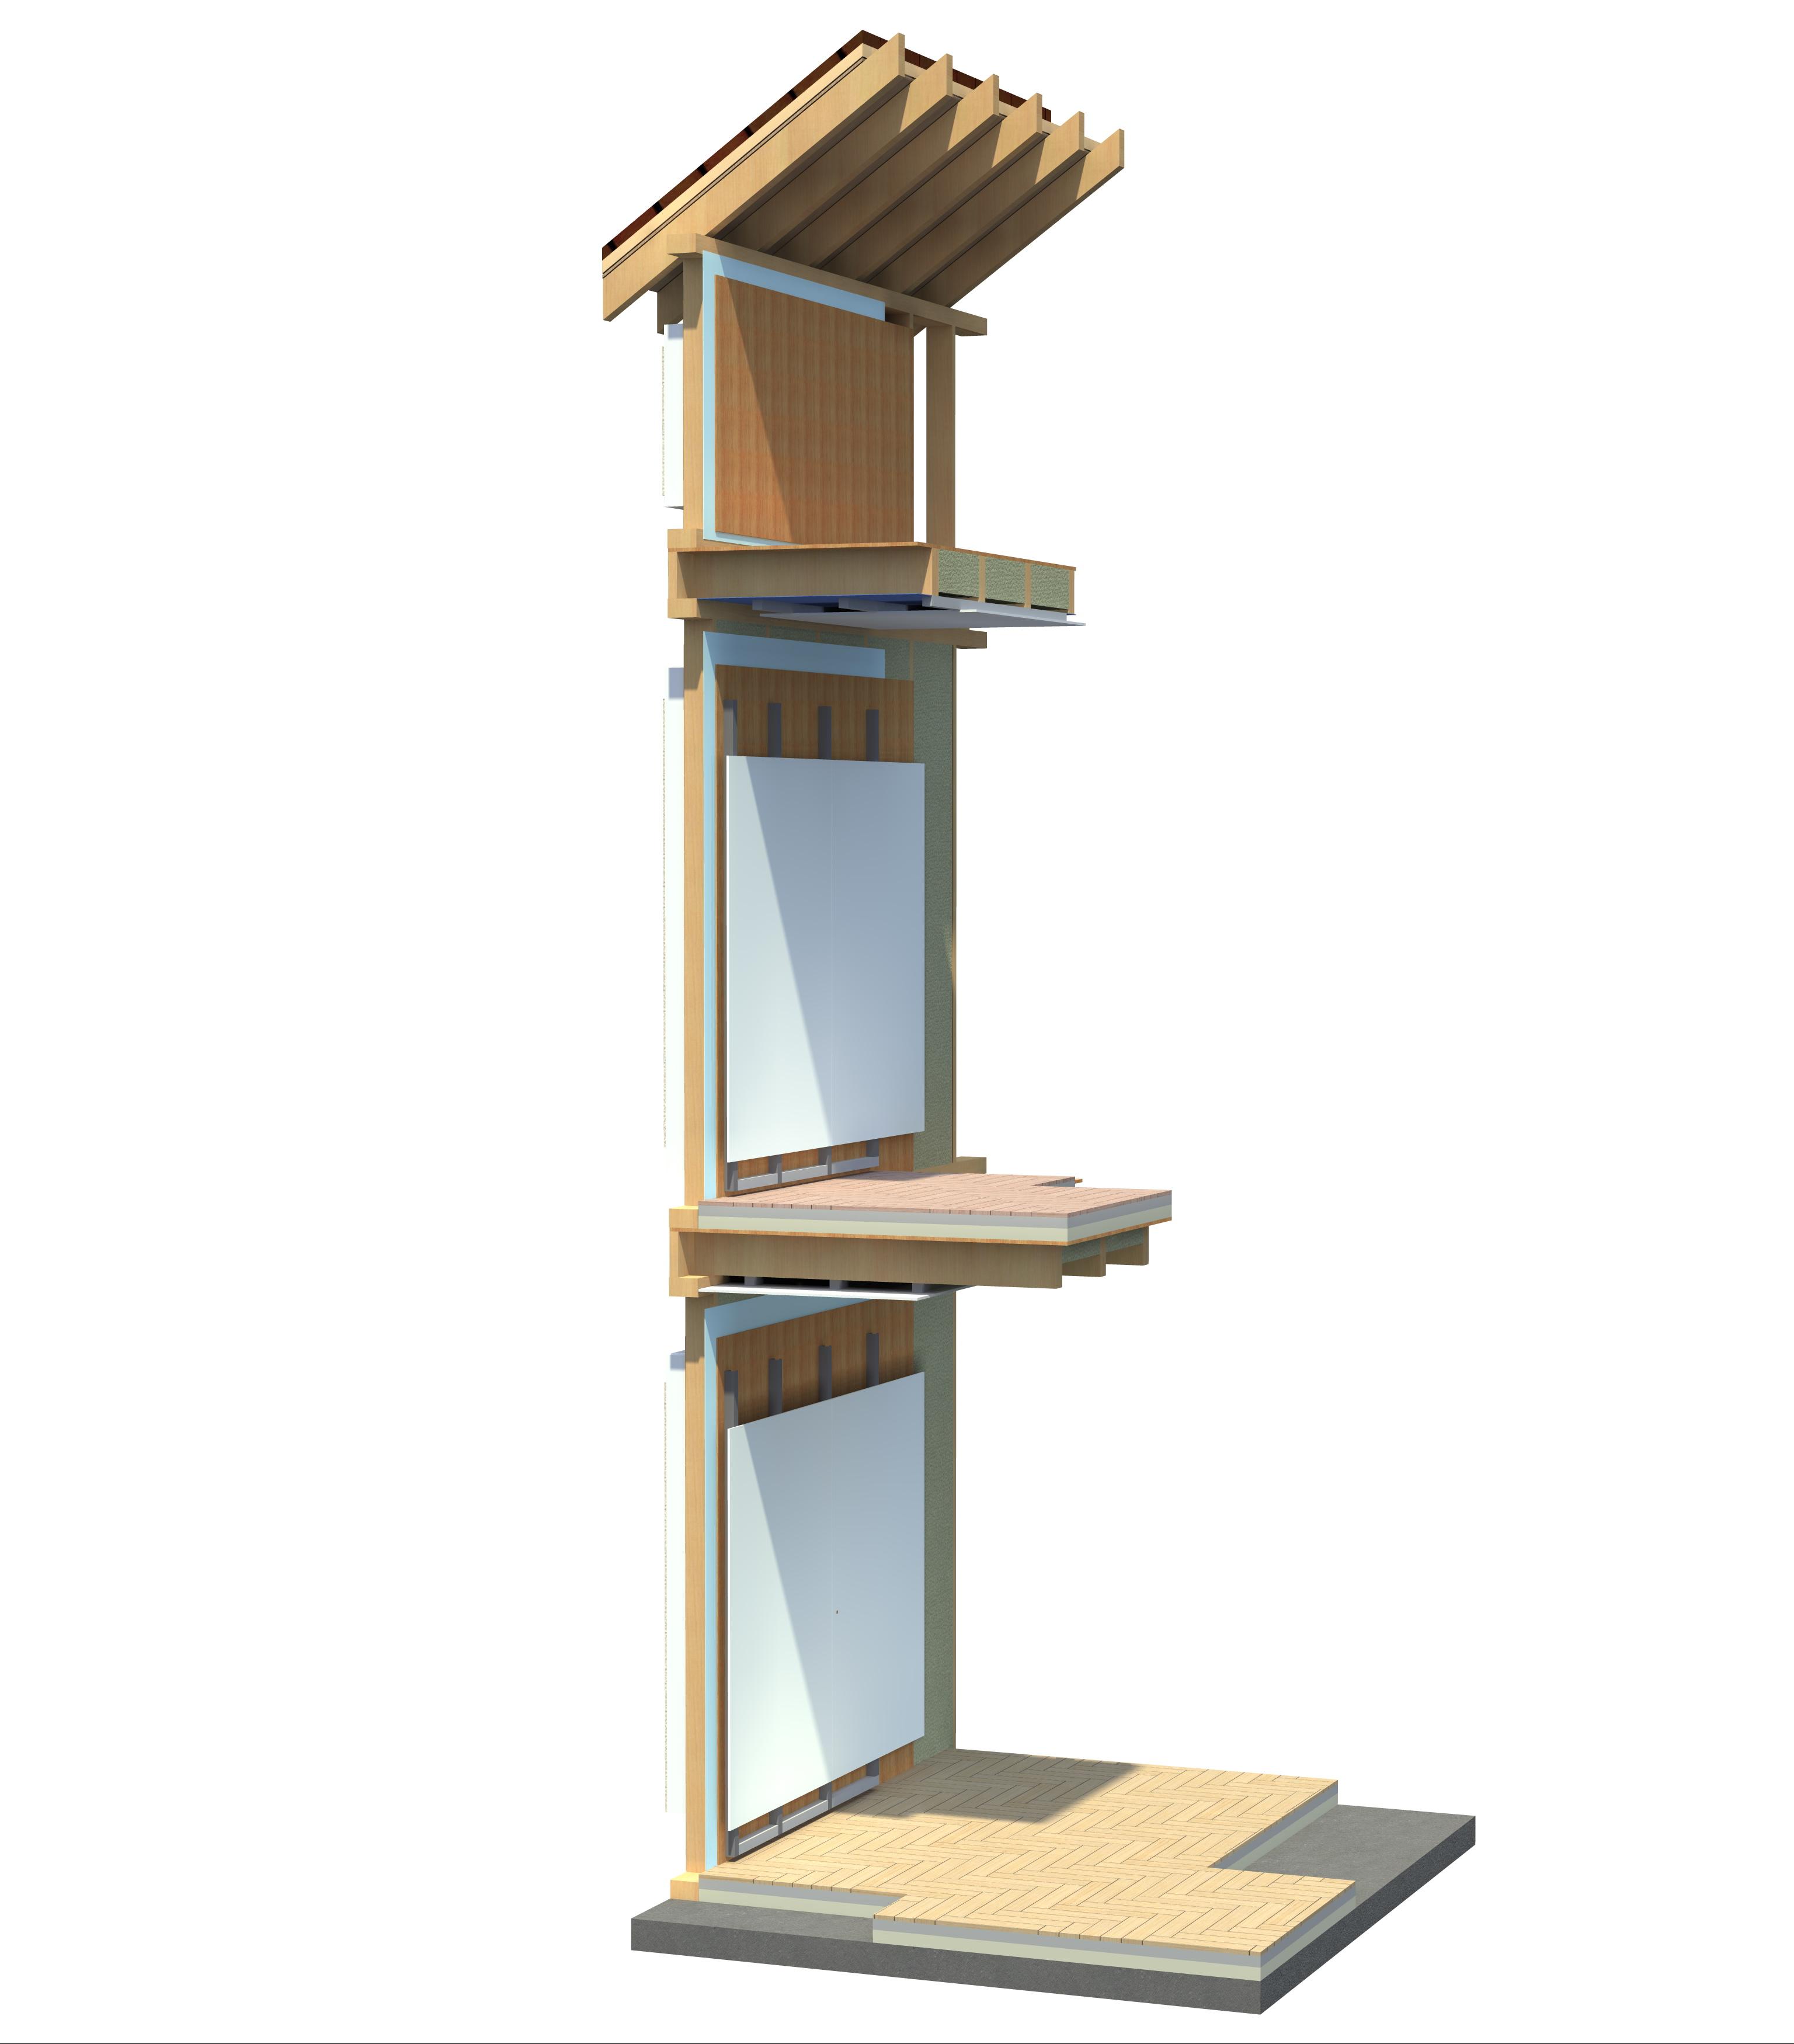 Structuri case din lemn NATURAL LIVING - Poza 6